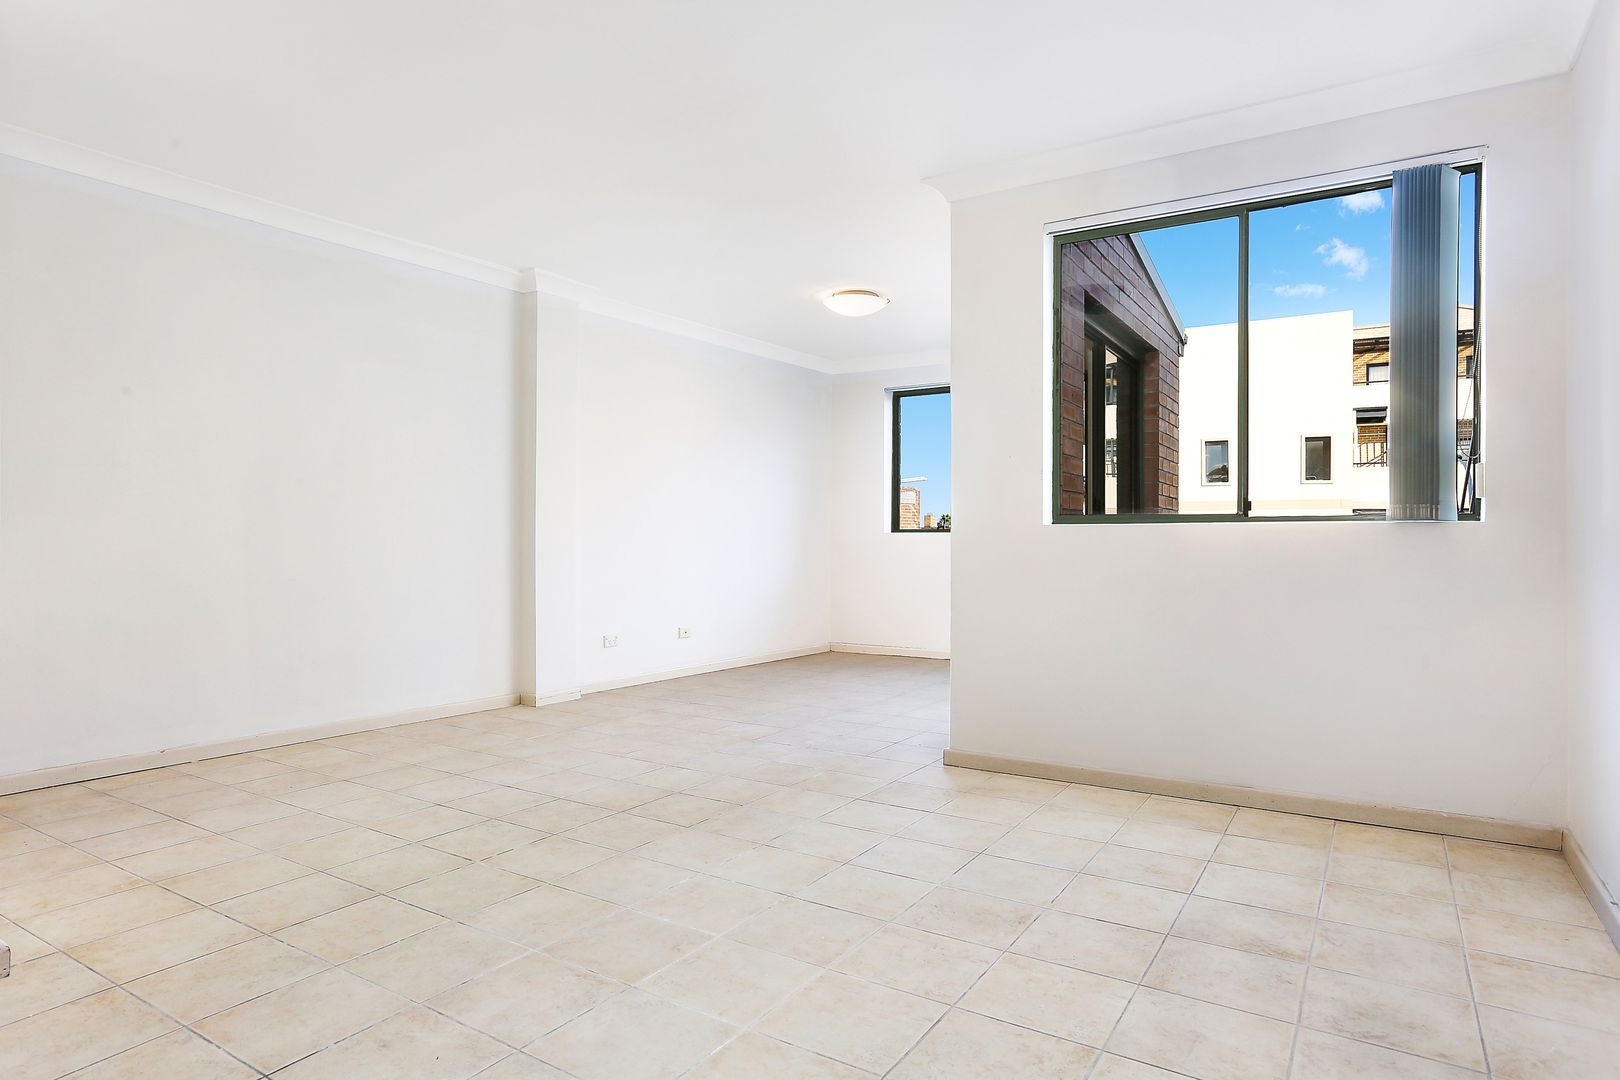 2/4 Bankstown City Plaza, Bankstown NSW 2200, Image 2